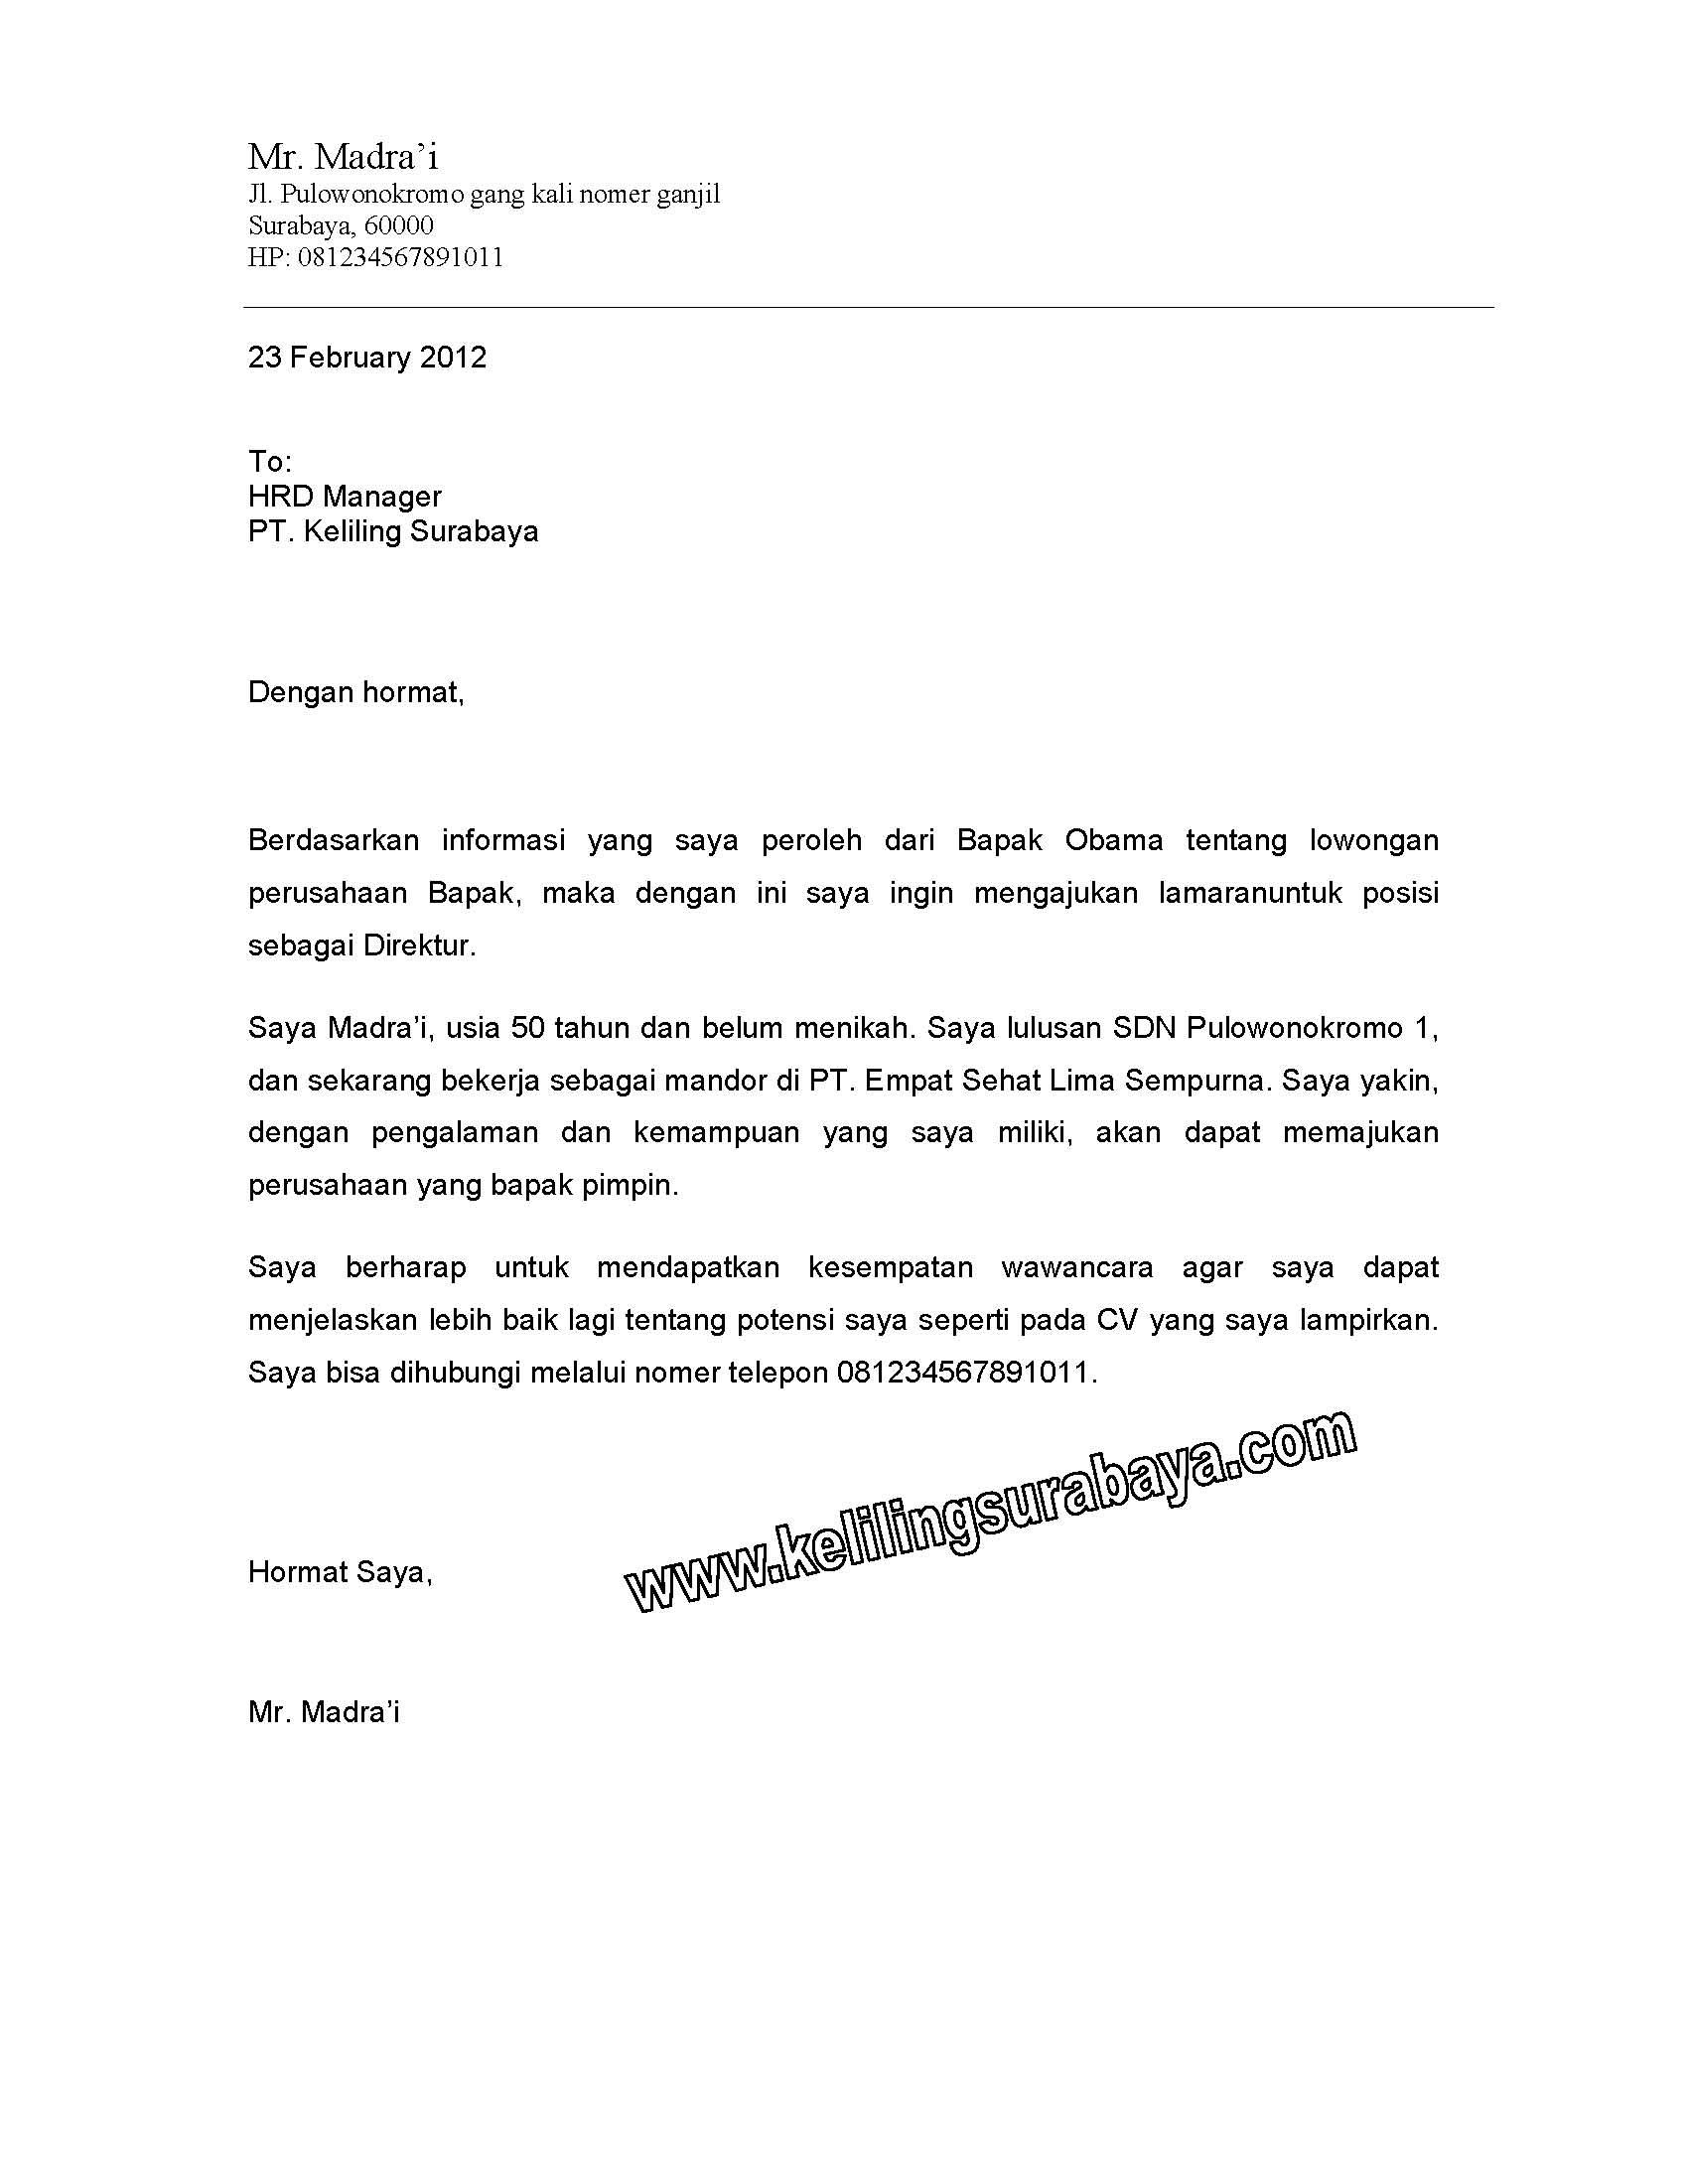 Contoh Application Letter Flight Attendant Sports Cover Letter - Resume-letter-contoh